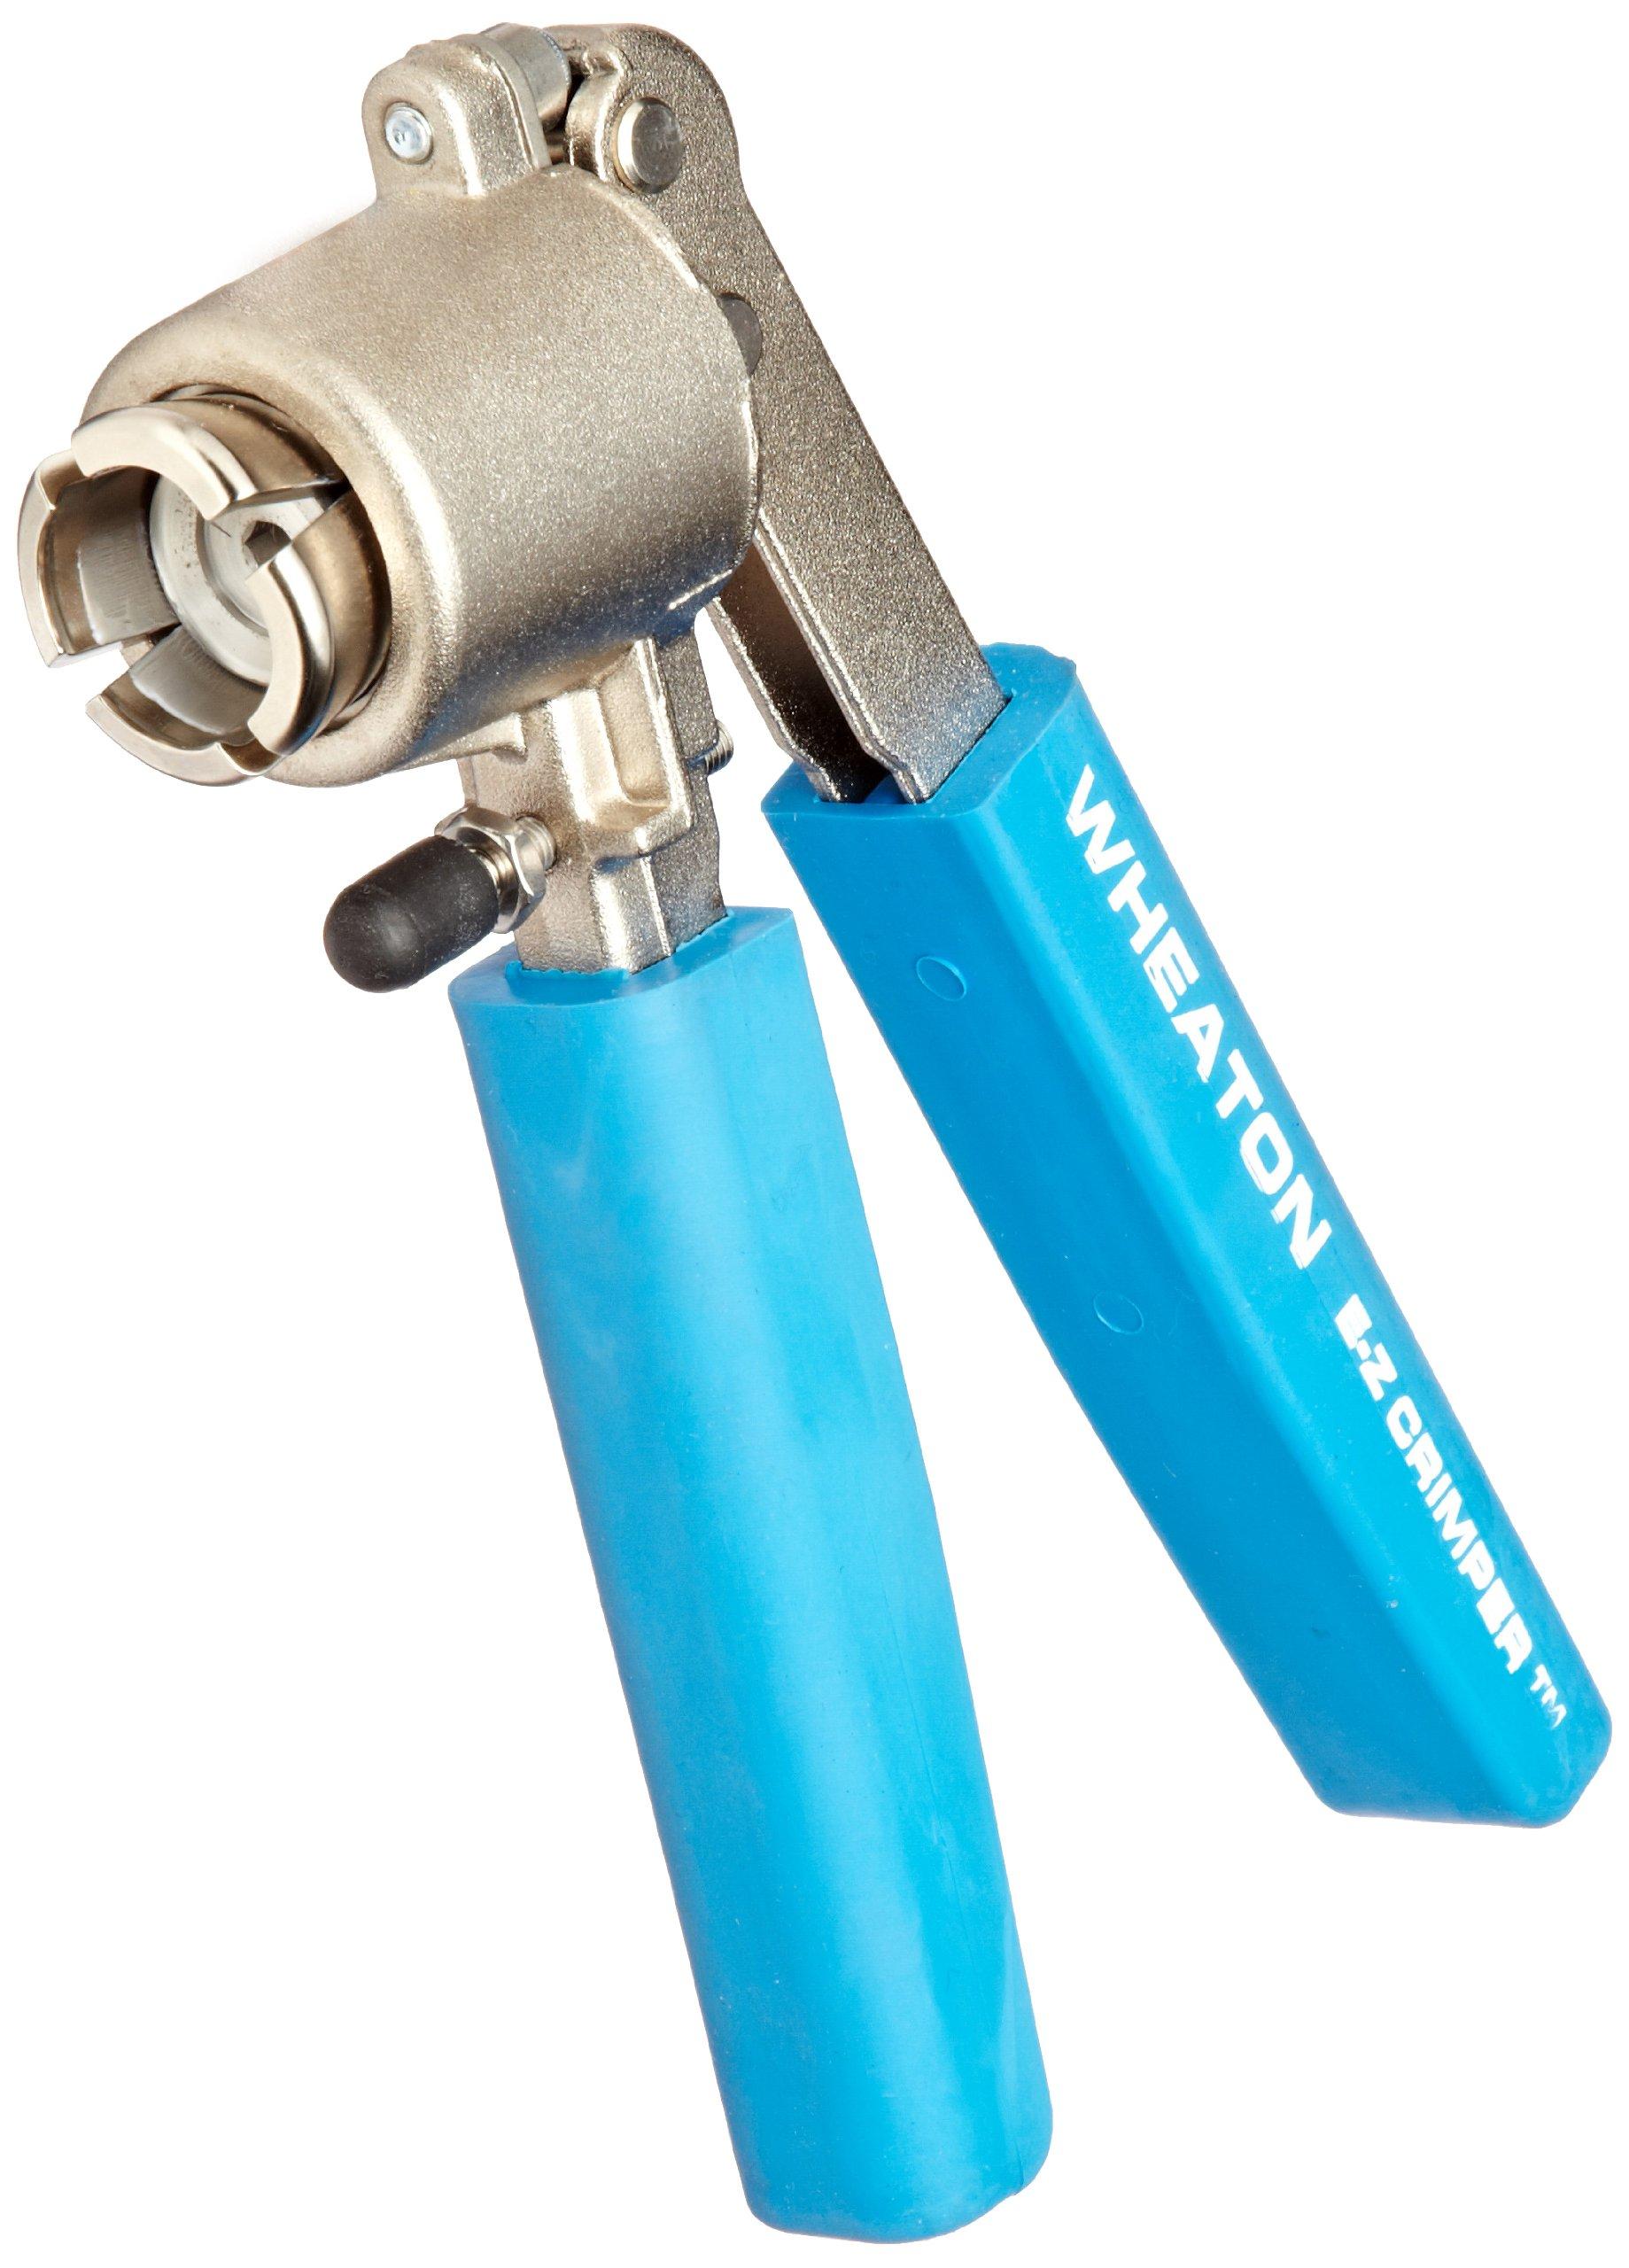 Wheaton W225302 E-Z Crimper Attaches 13mm Aluminum Seals To Serum Finish Bottles/Vials